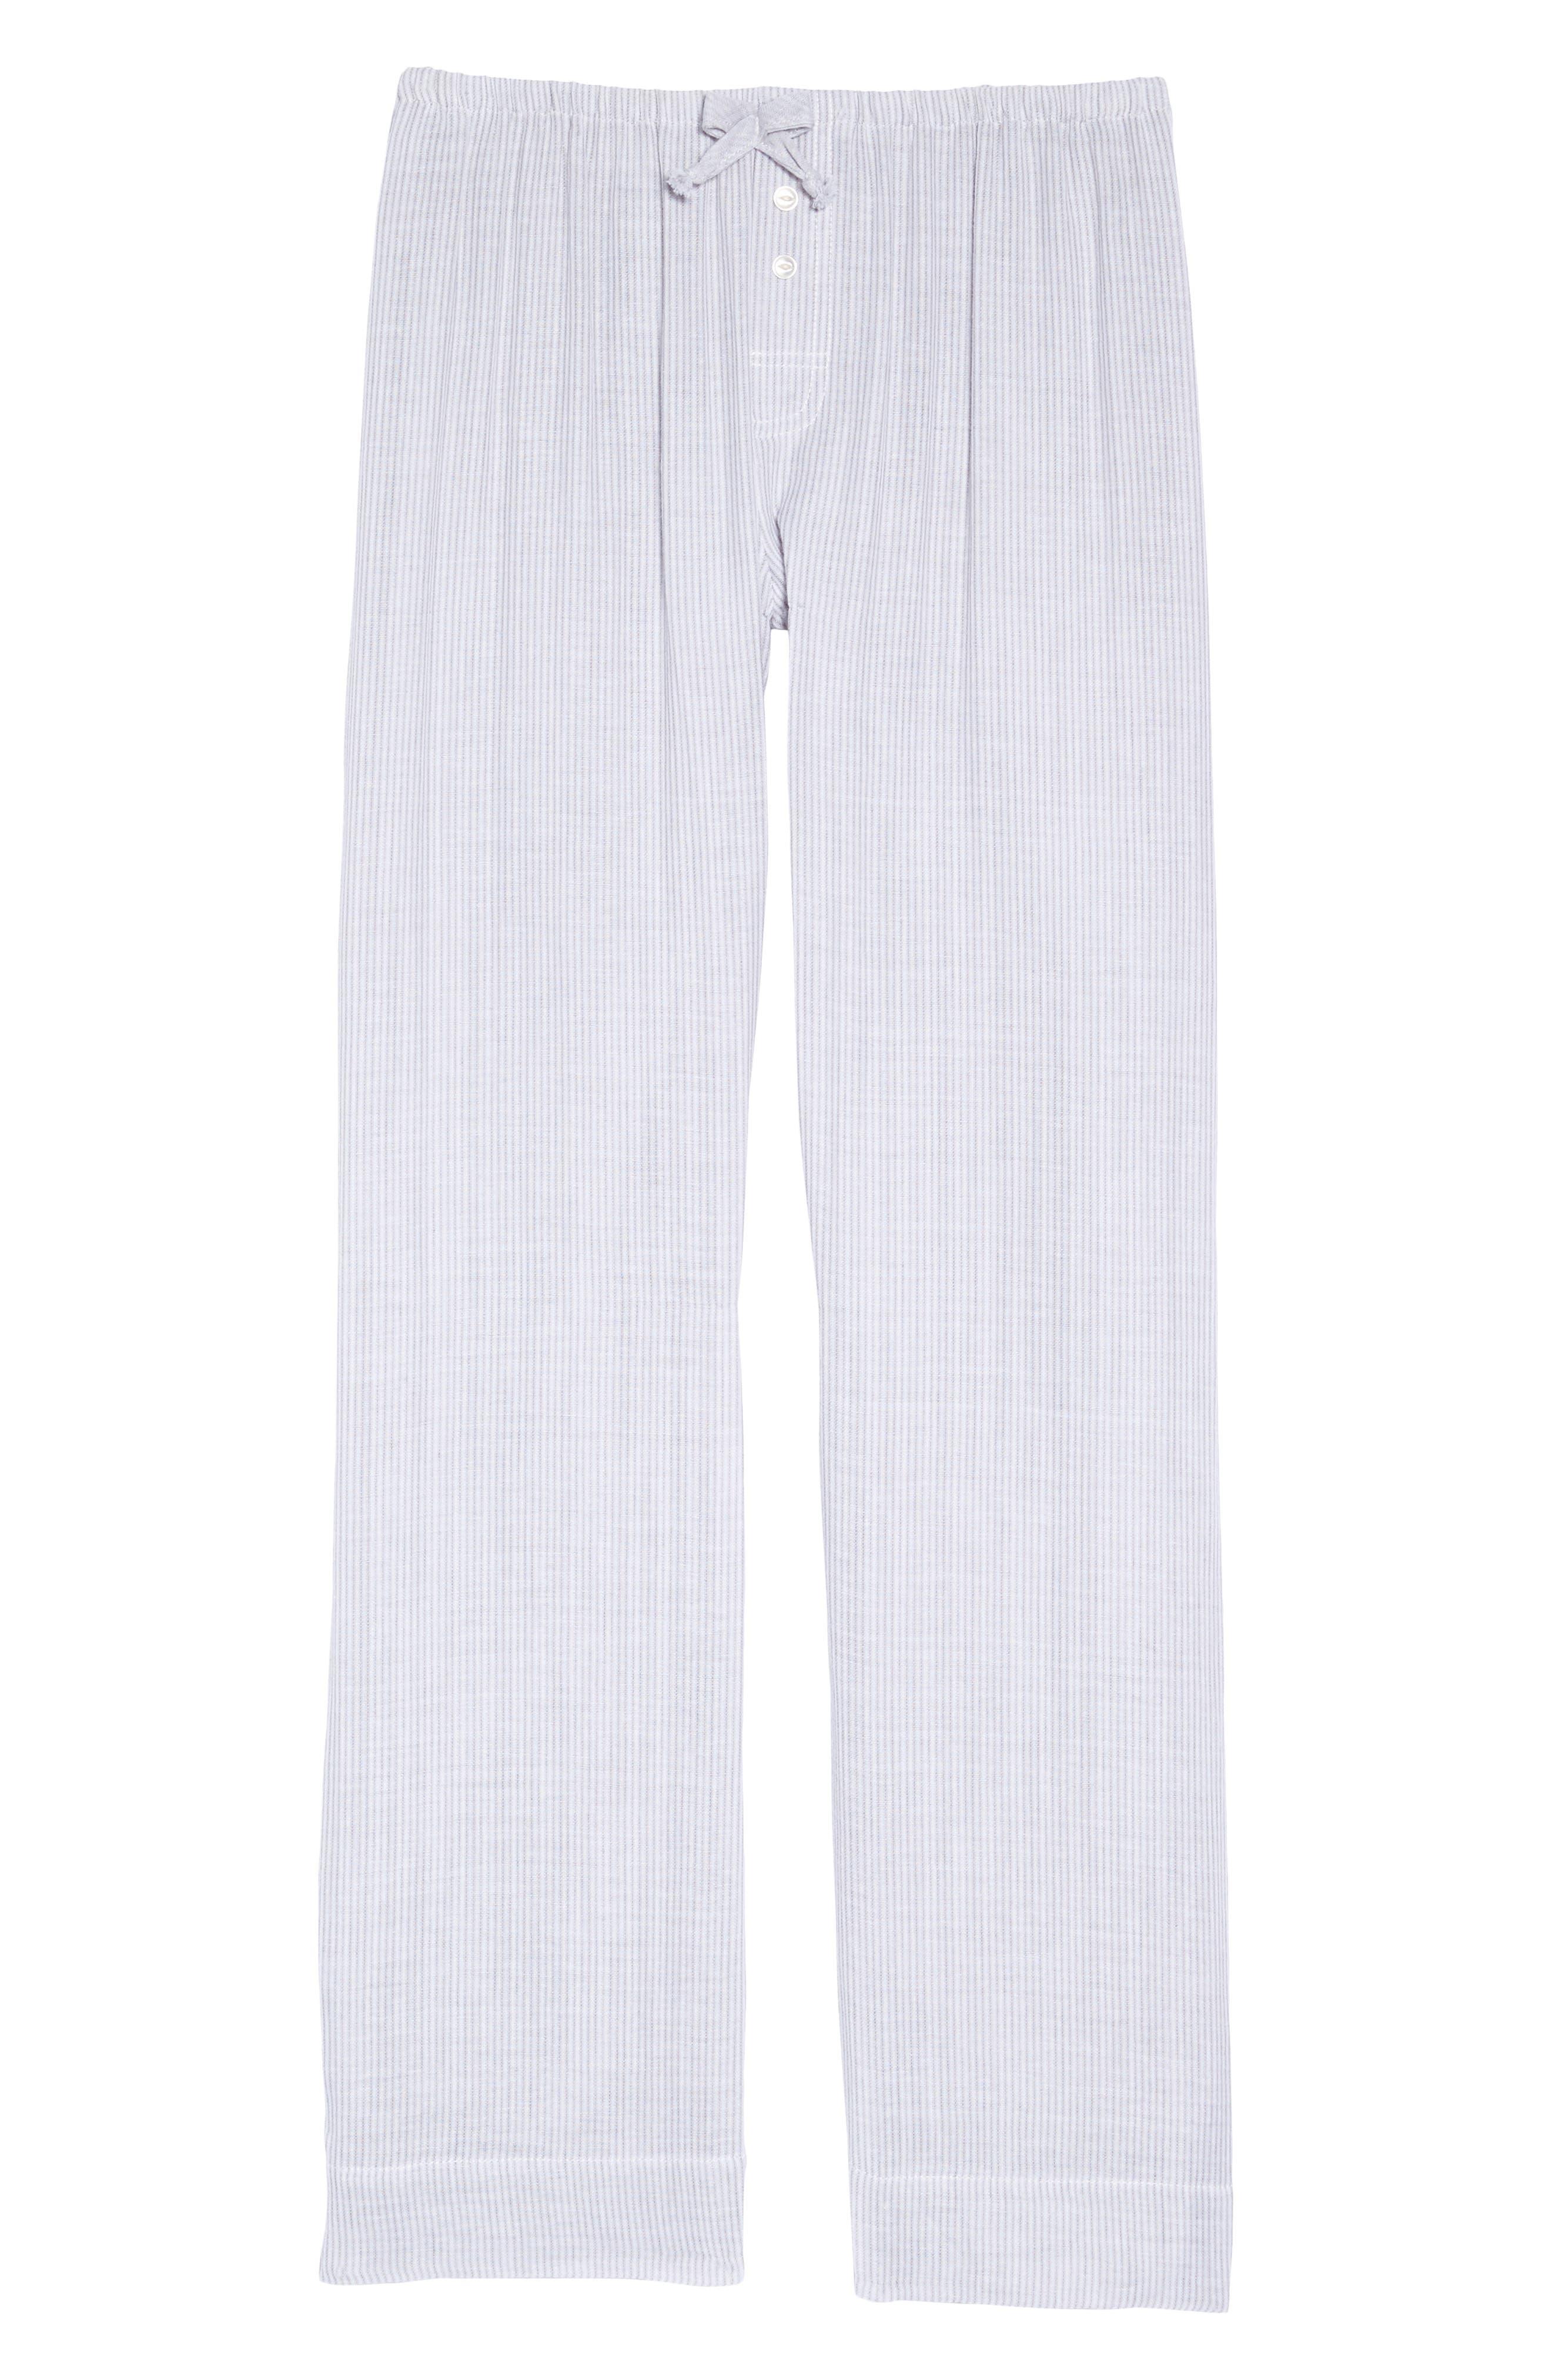 Stripe Pajama Pants,                             Alternate thumbnail 4, color,                             Grey/ White